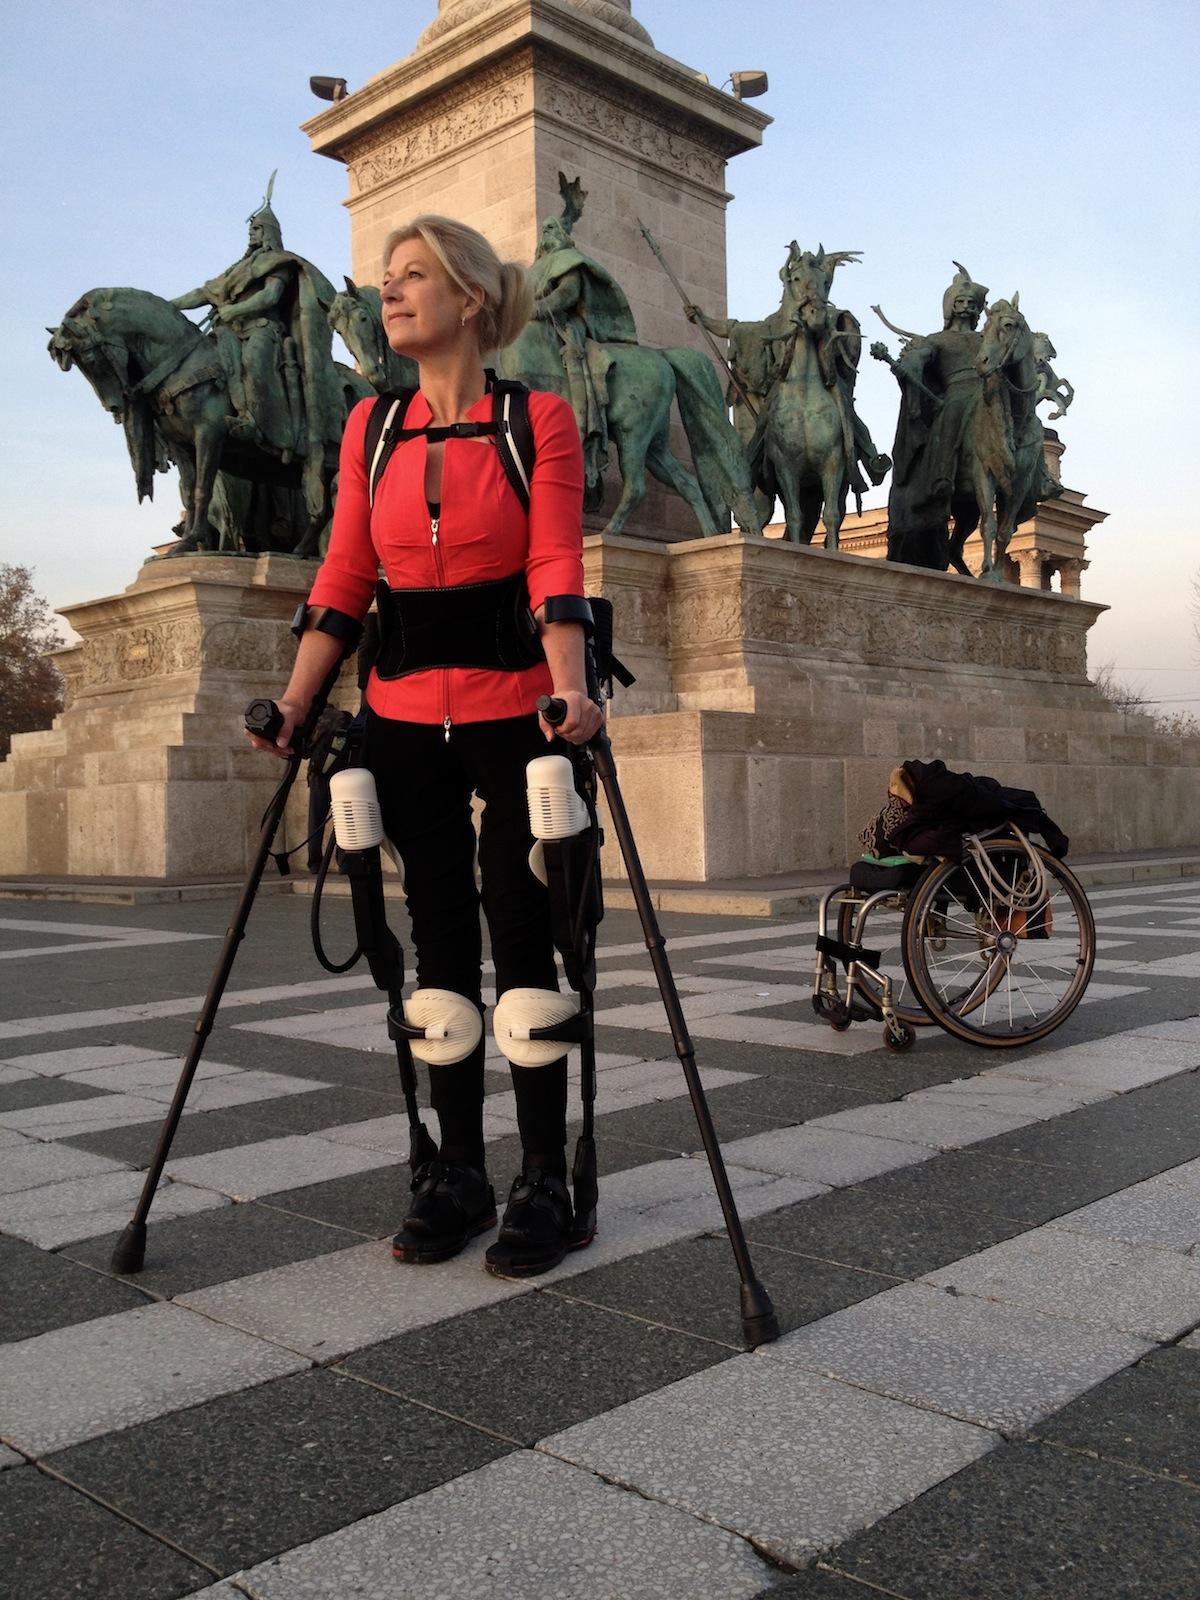 Walking Again in a Personalized Exoskeletal Robot